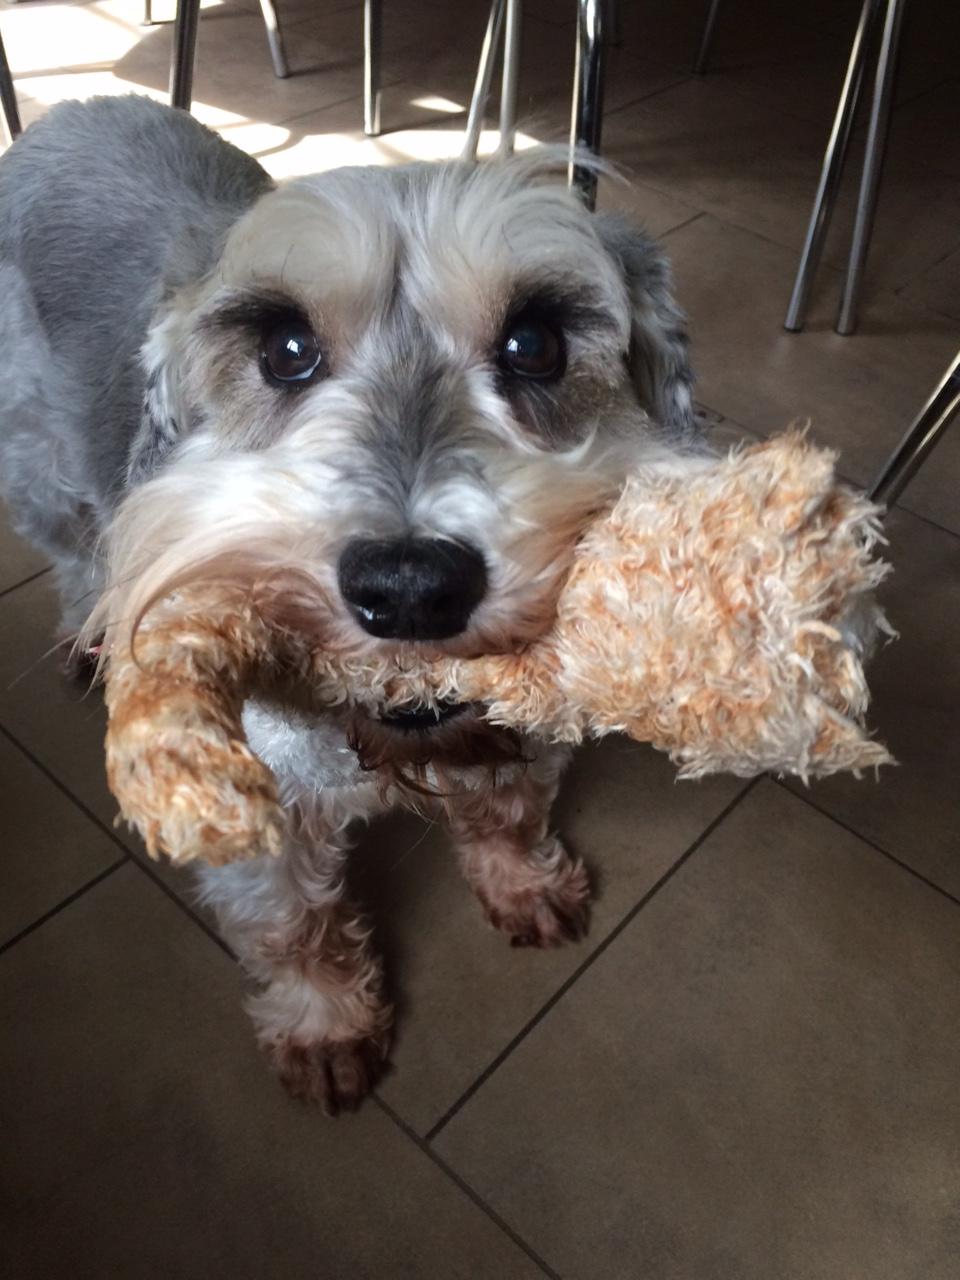 Playful Oscar!